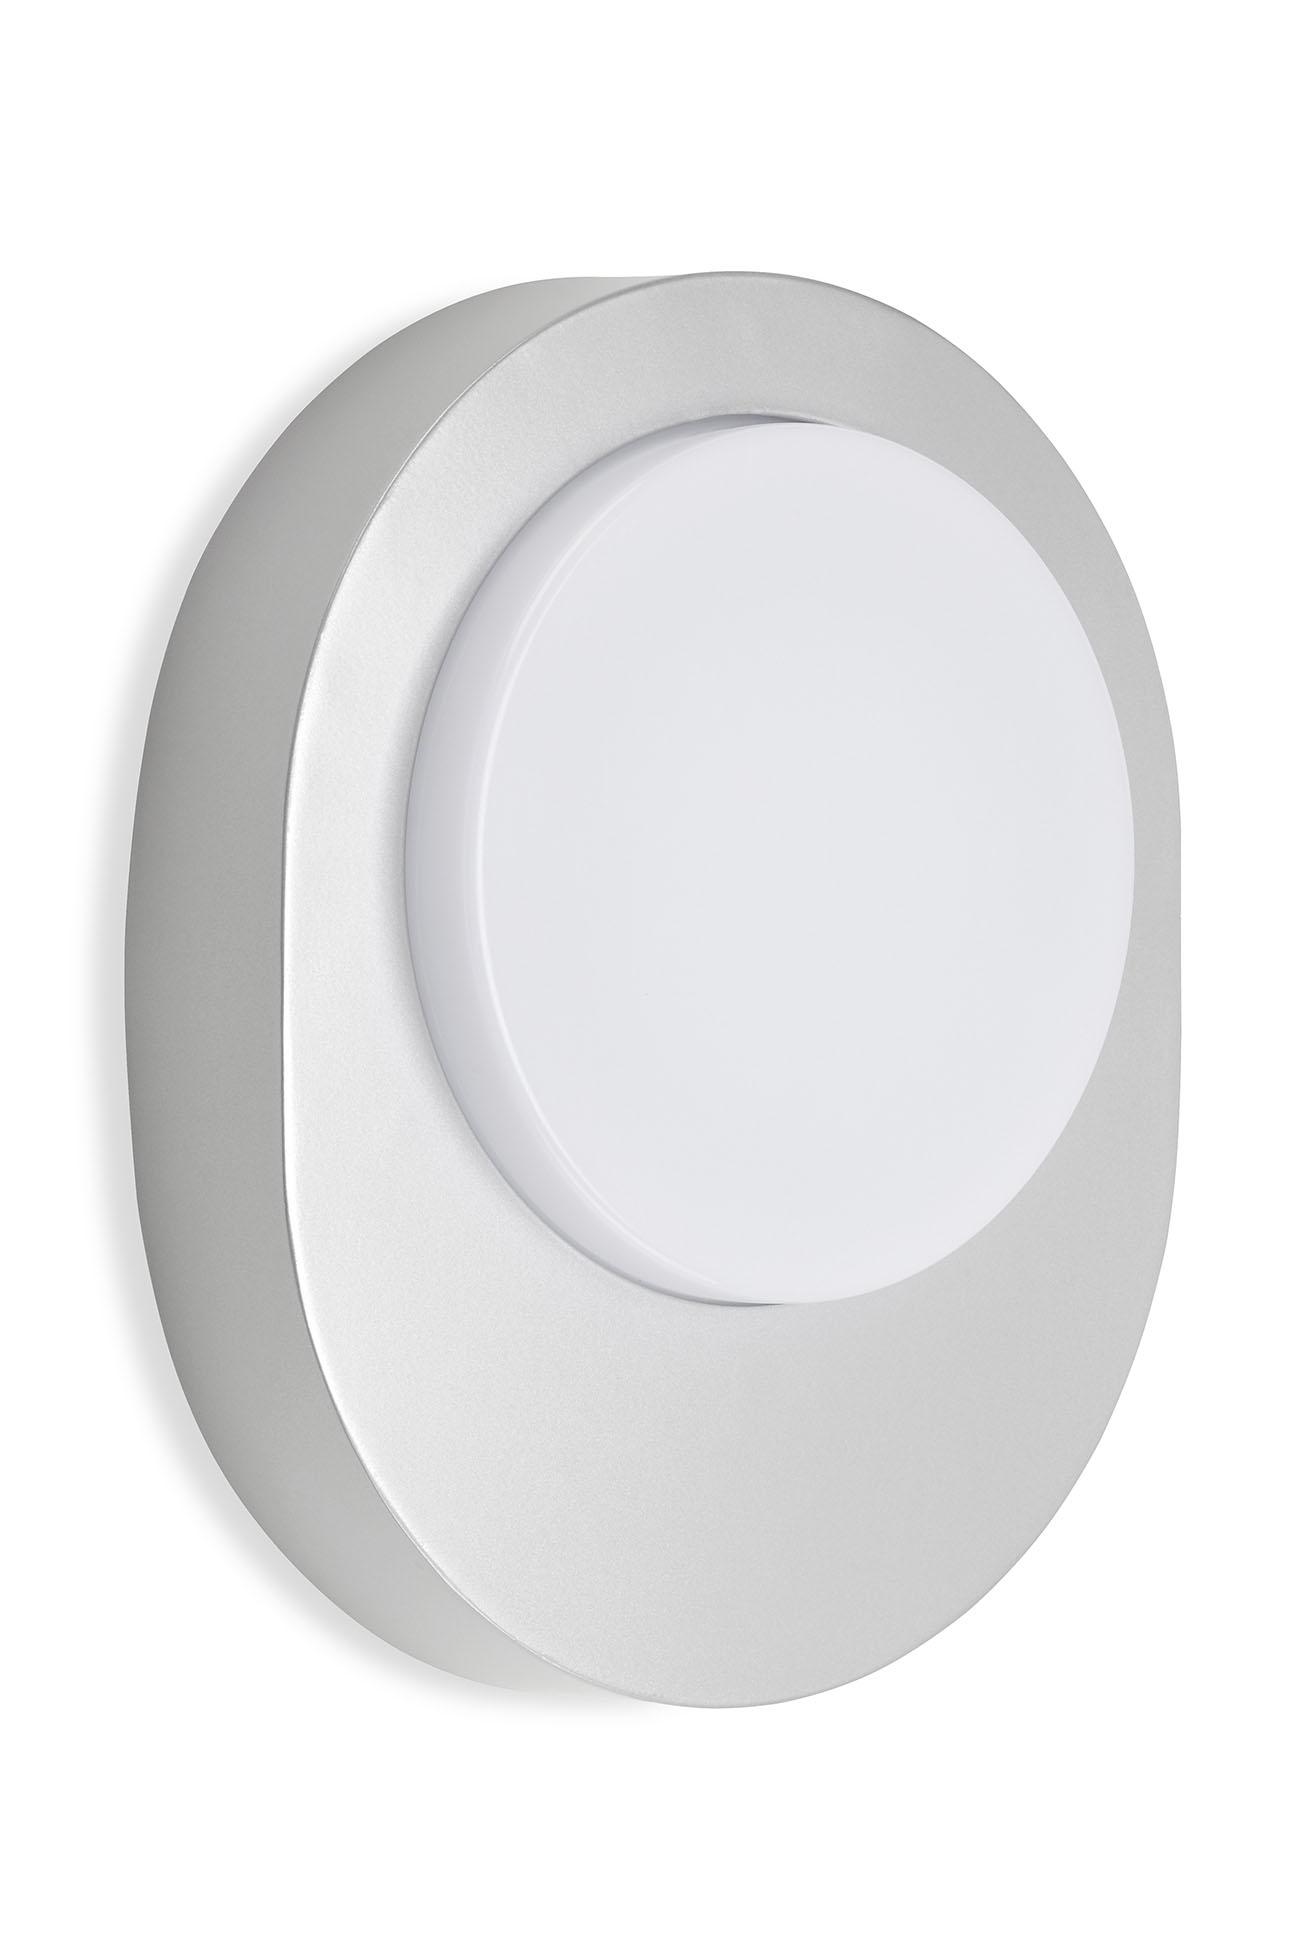 TELEFUNKEN LED Aussenwandleuchte, 20 cm, 8 W, Silber